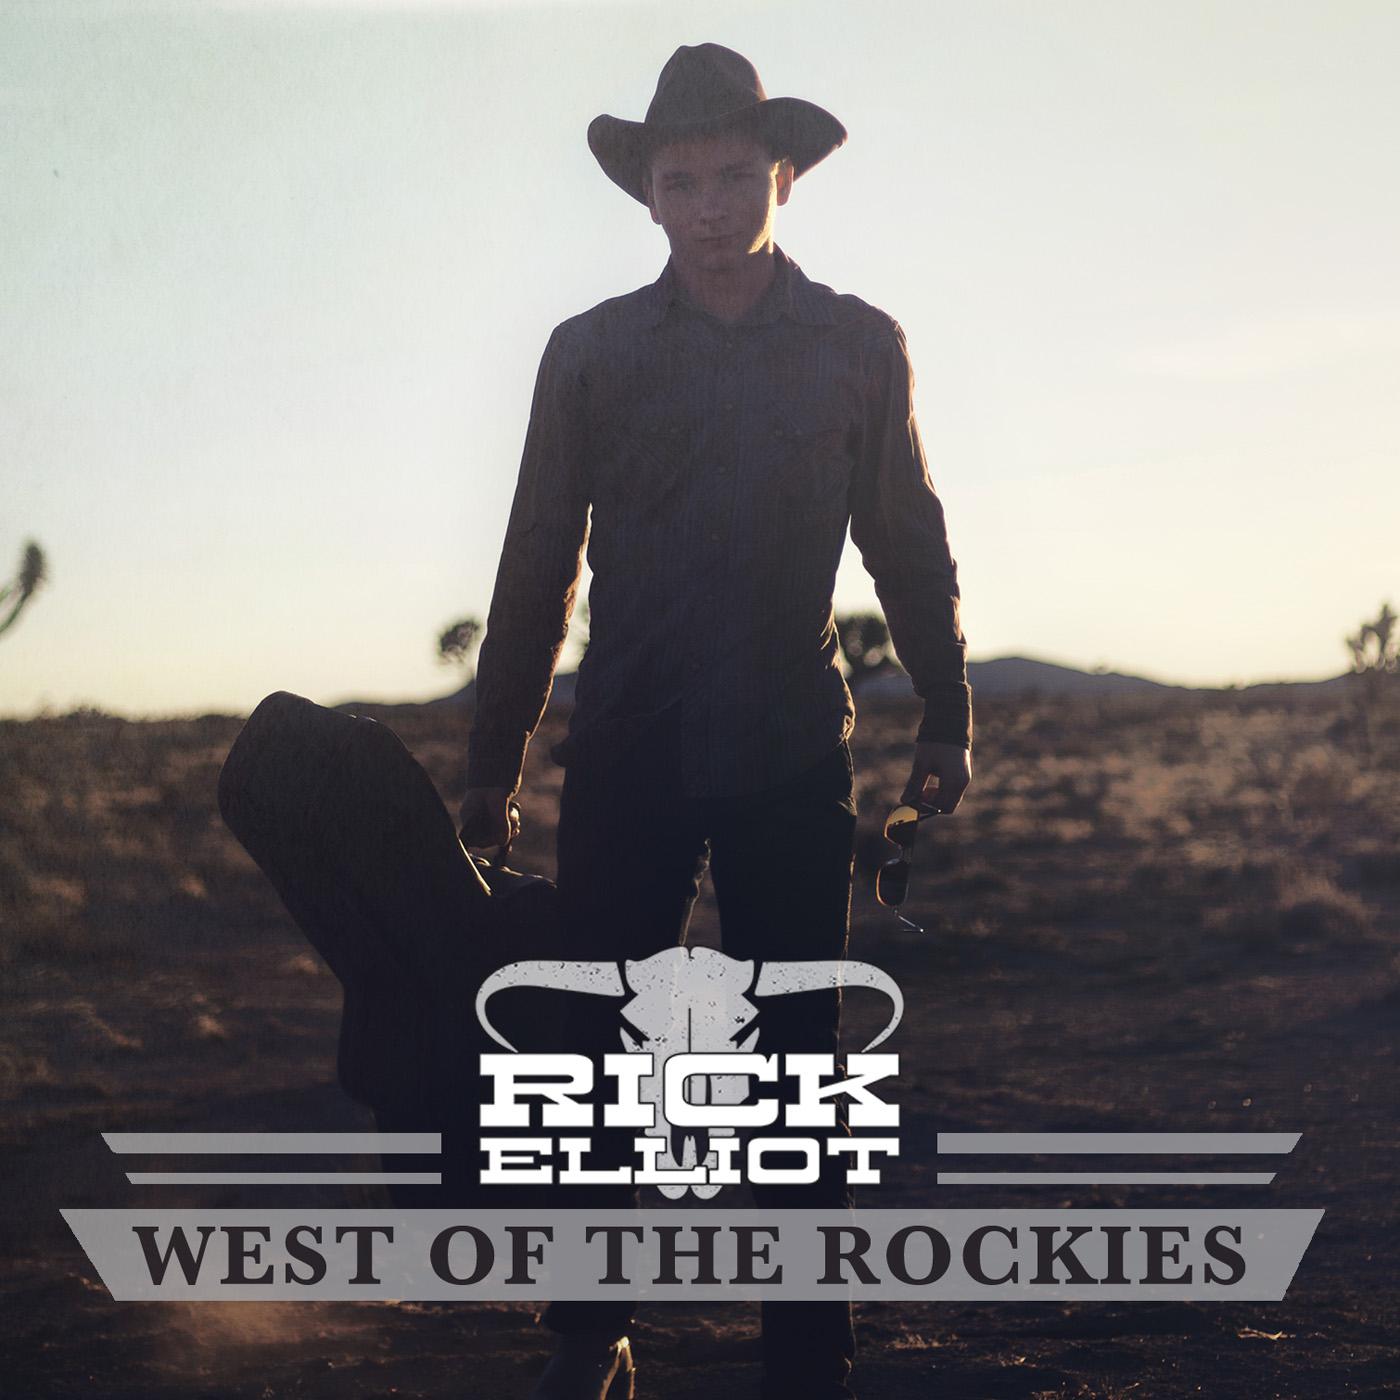 Rick Elliot Releases Debut EP, West of the Rockies